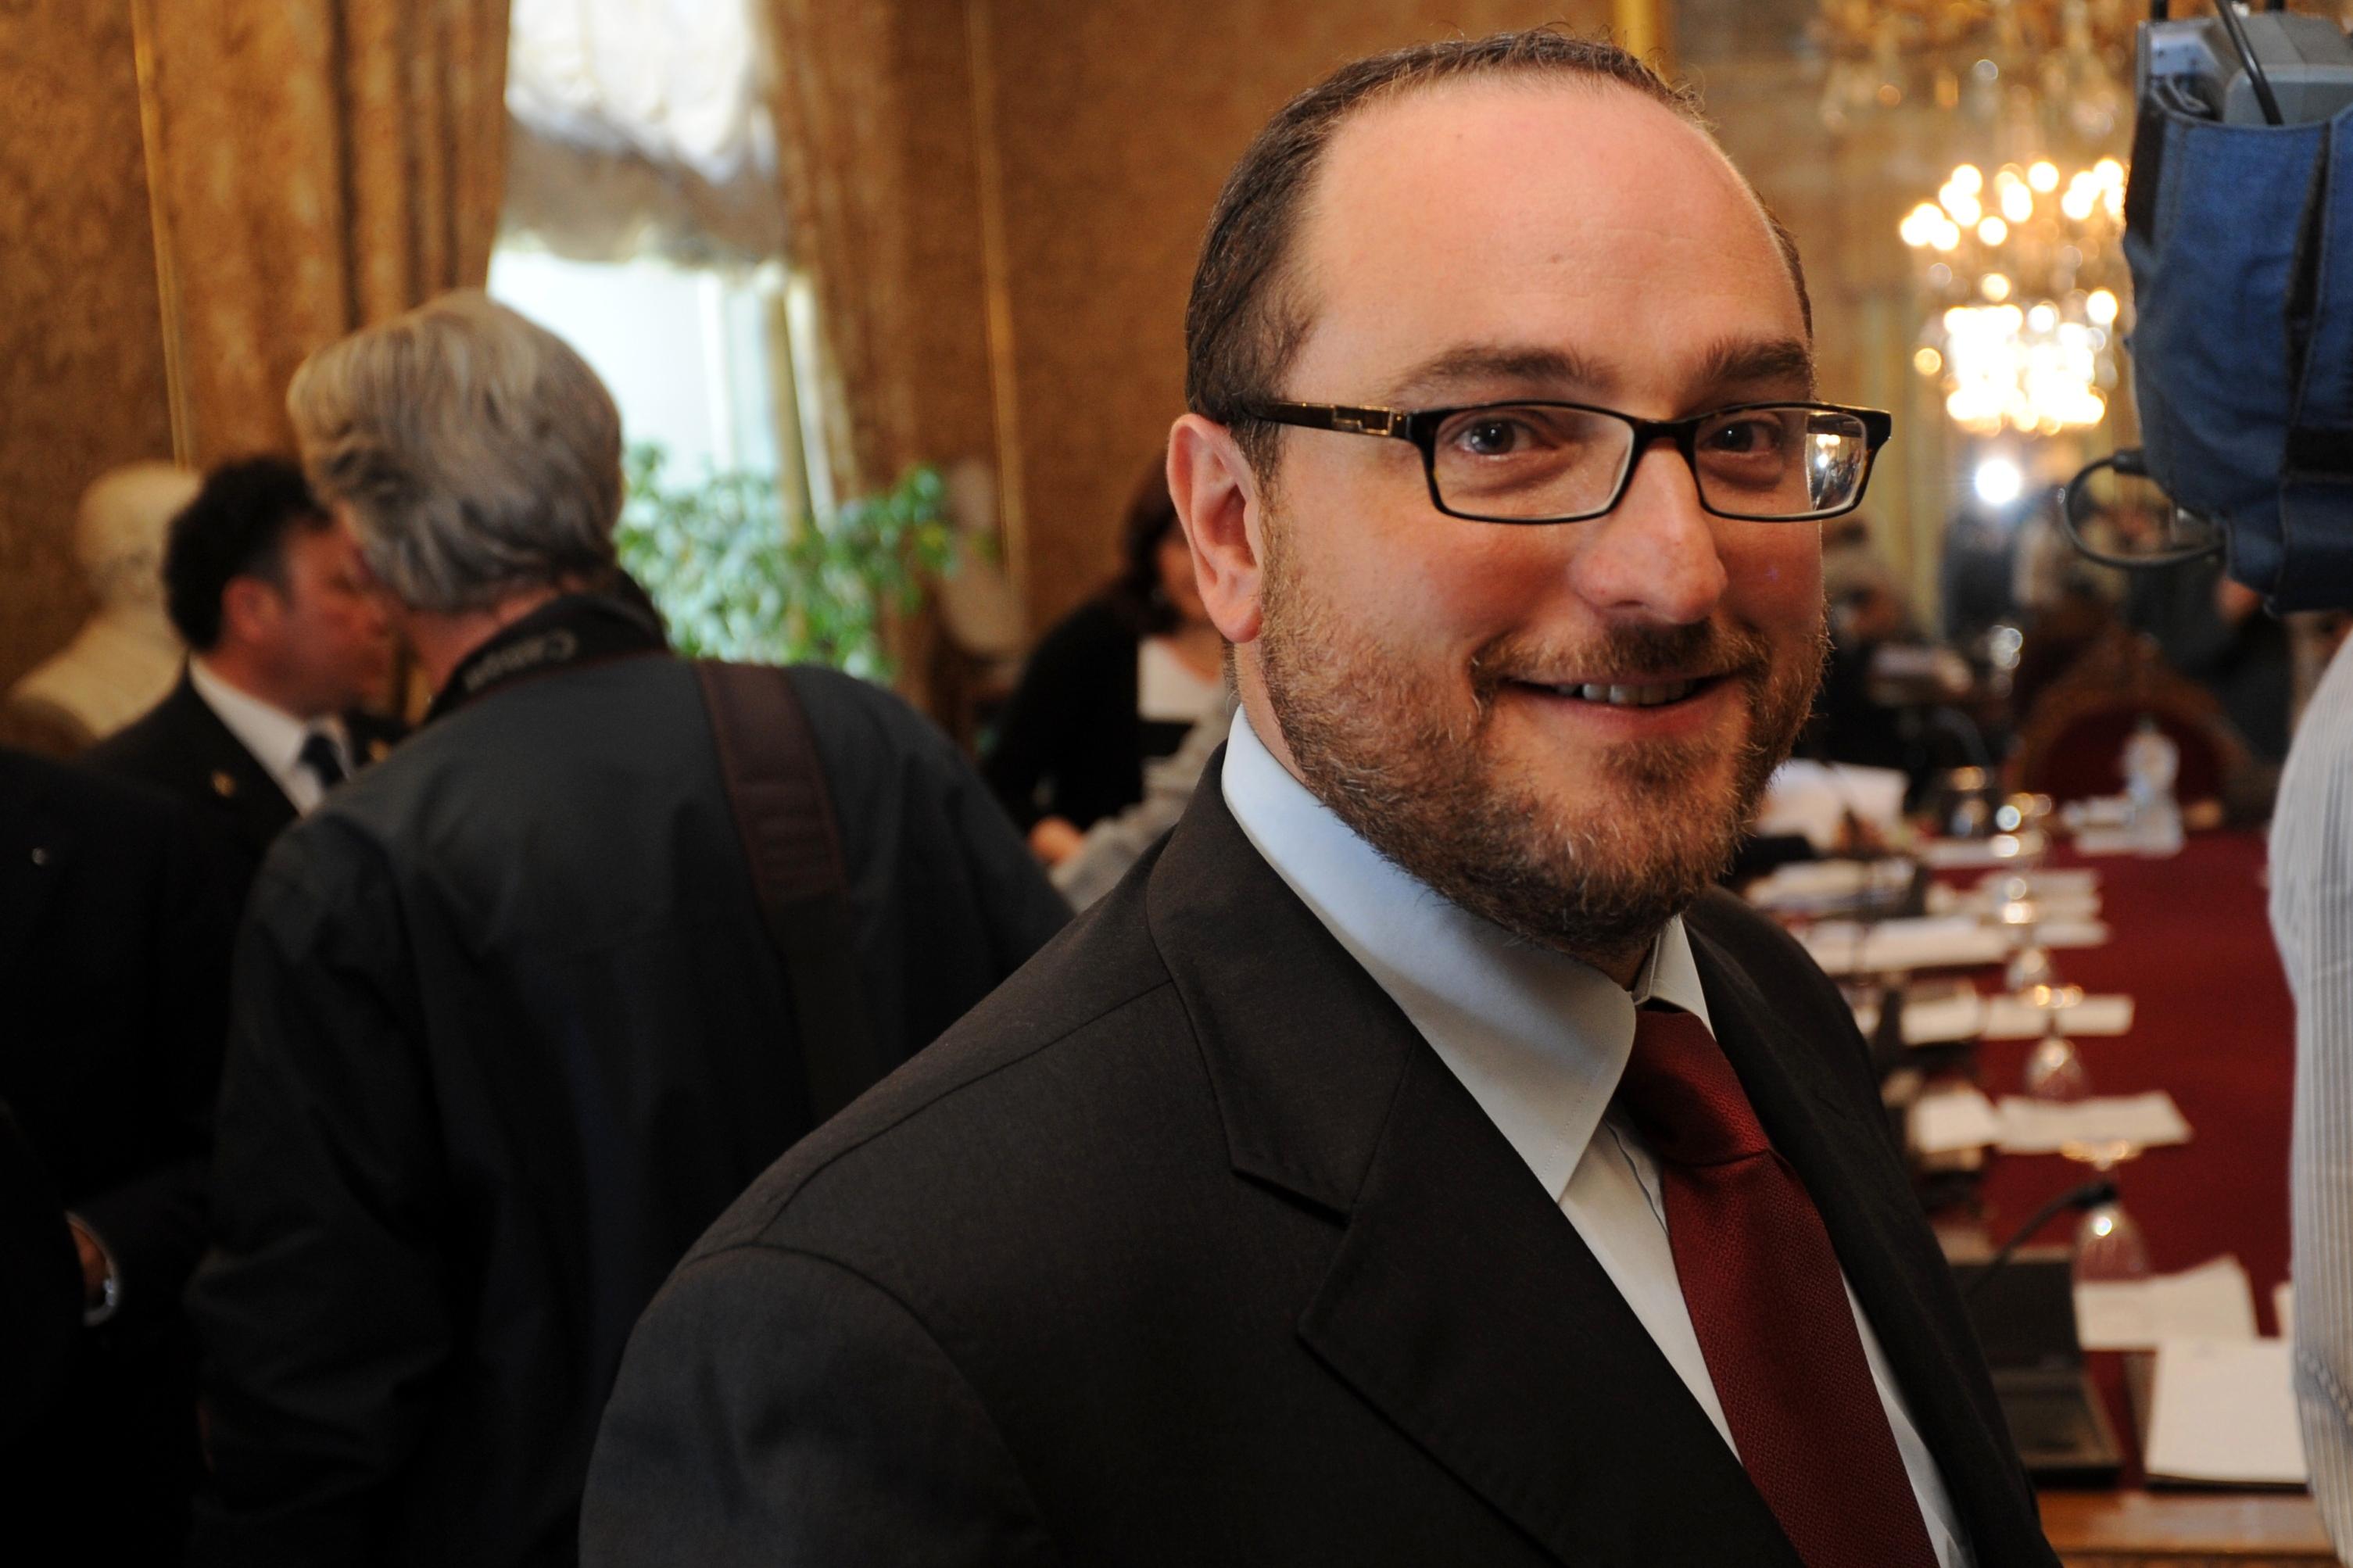 scrutatori elezioni regionali 2012 messina italy - photo#4